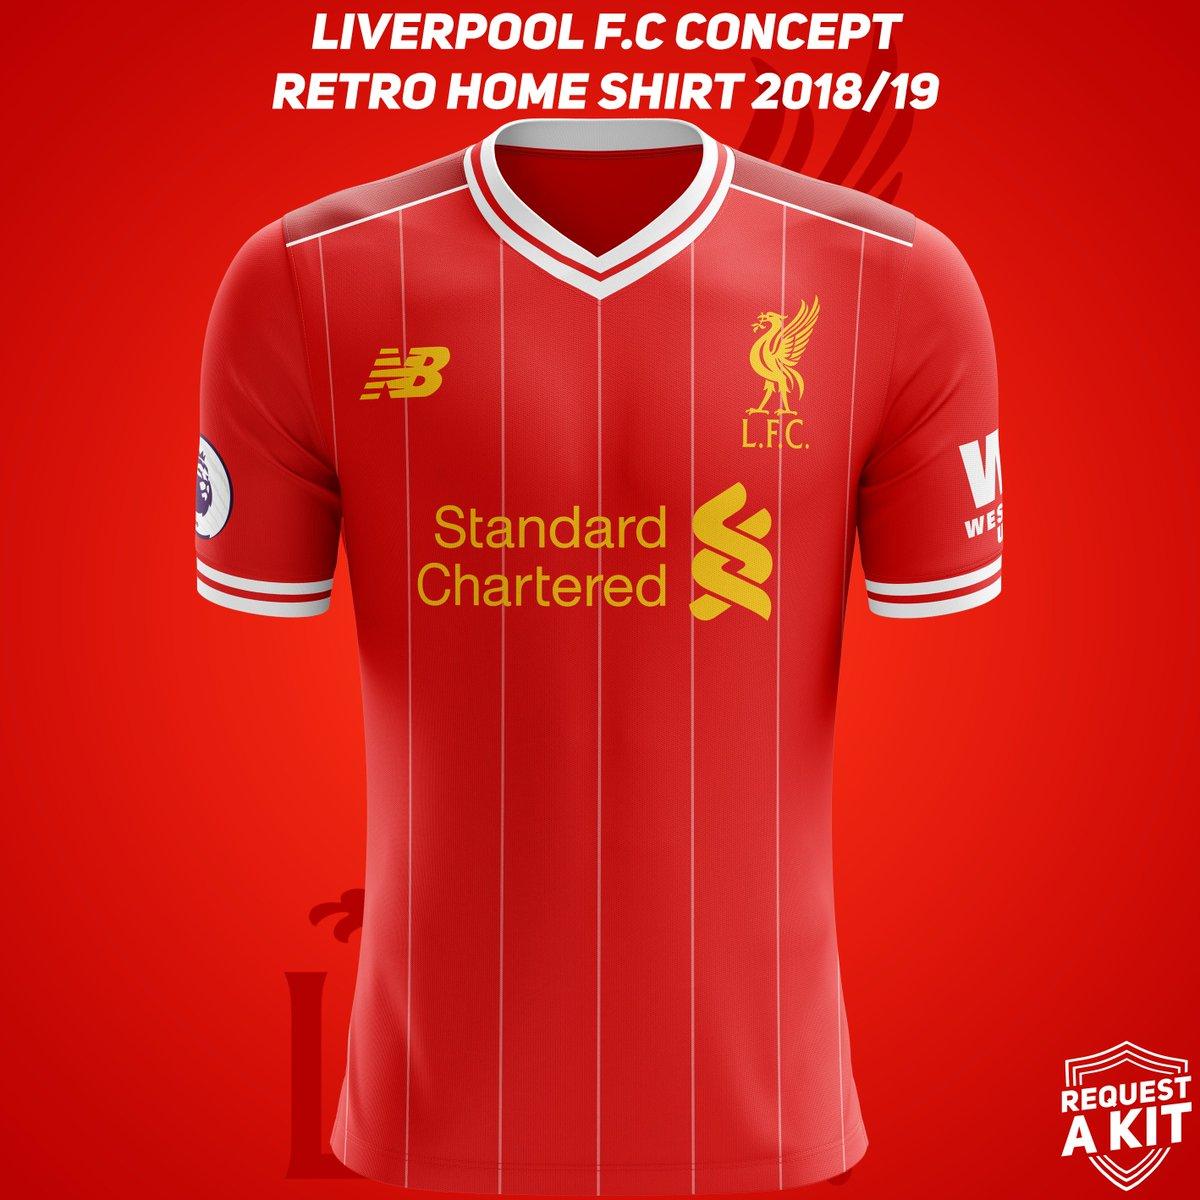 994c72becdd Retro Liverpool Shirts - DREAMWORKS